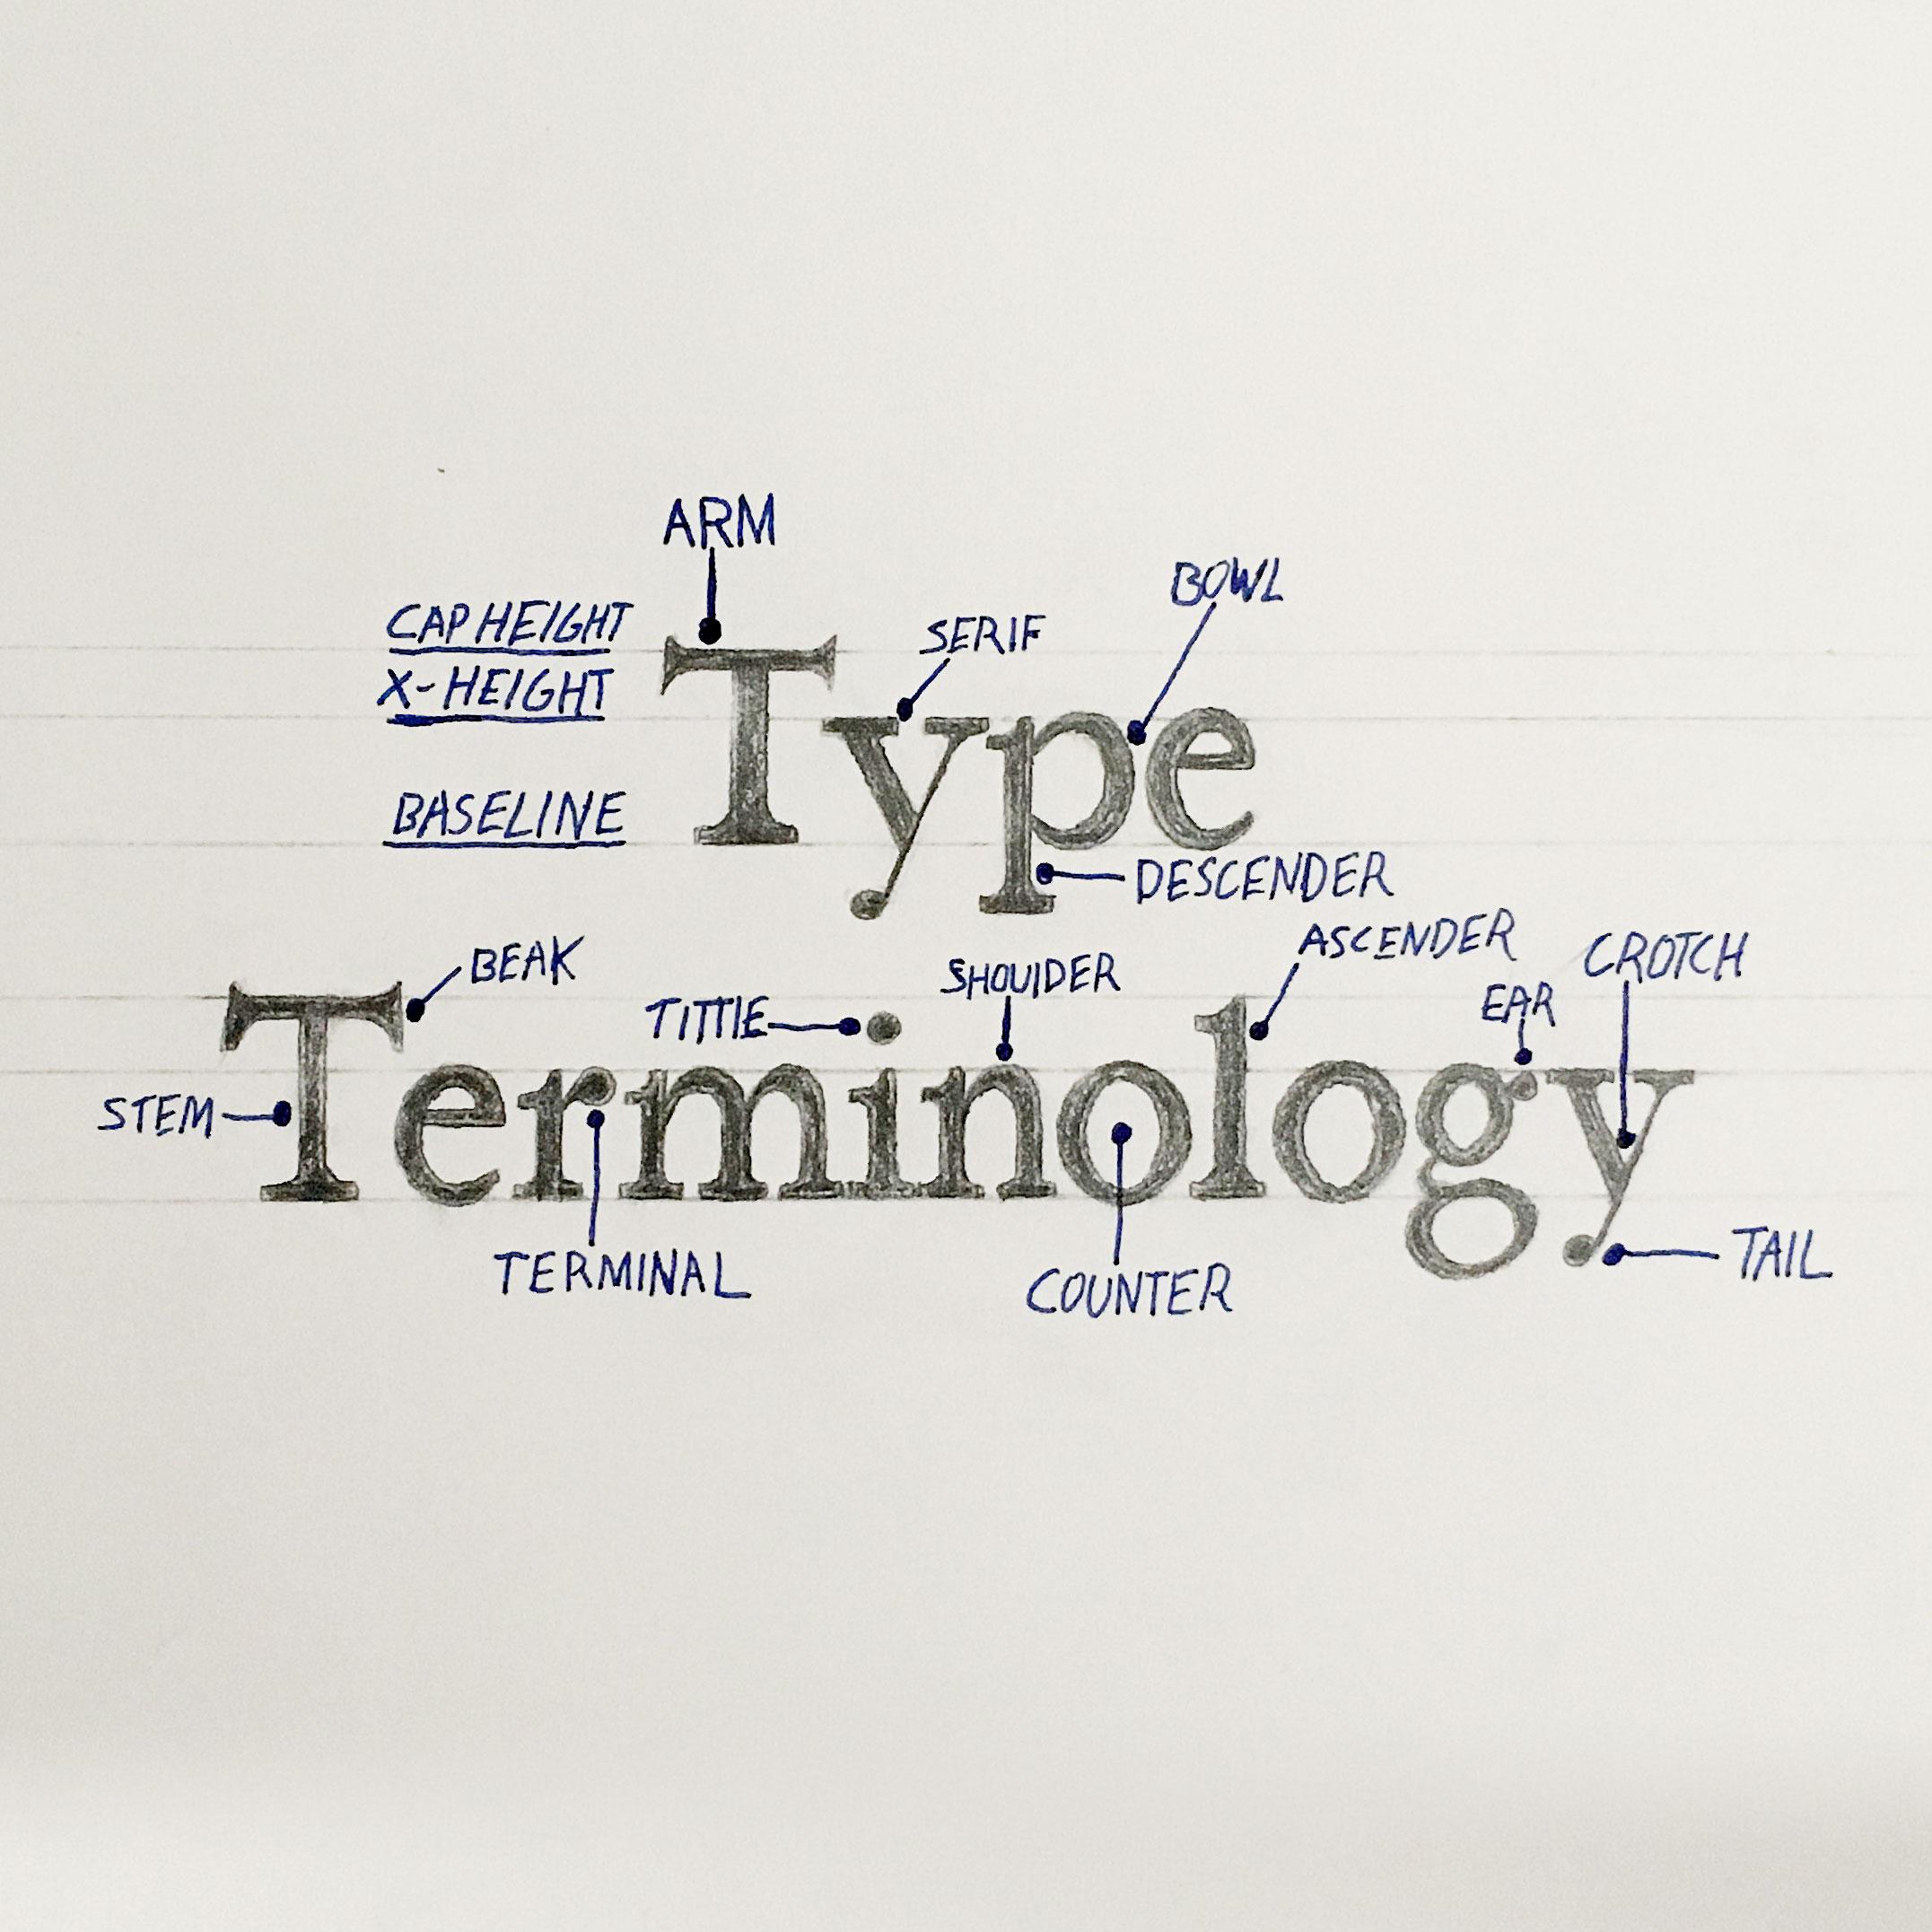 EDC_2017_Type_Terminology.jpg